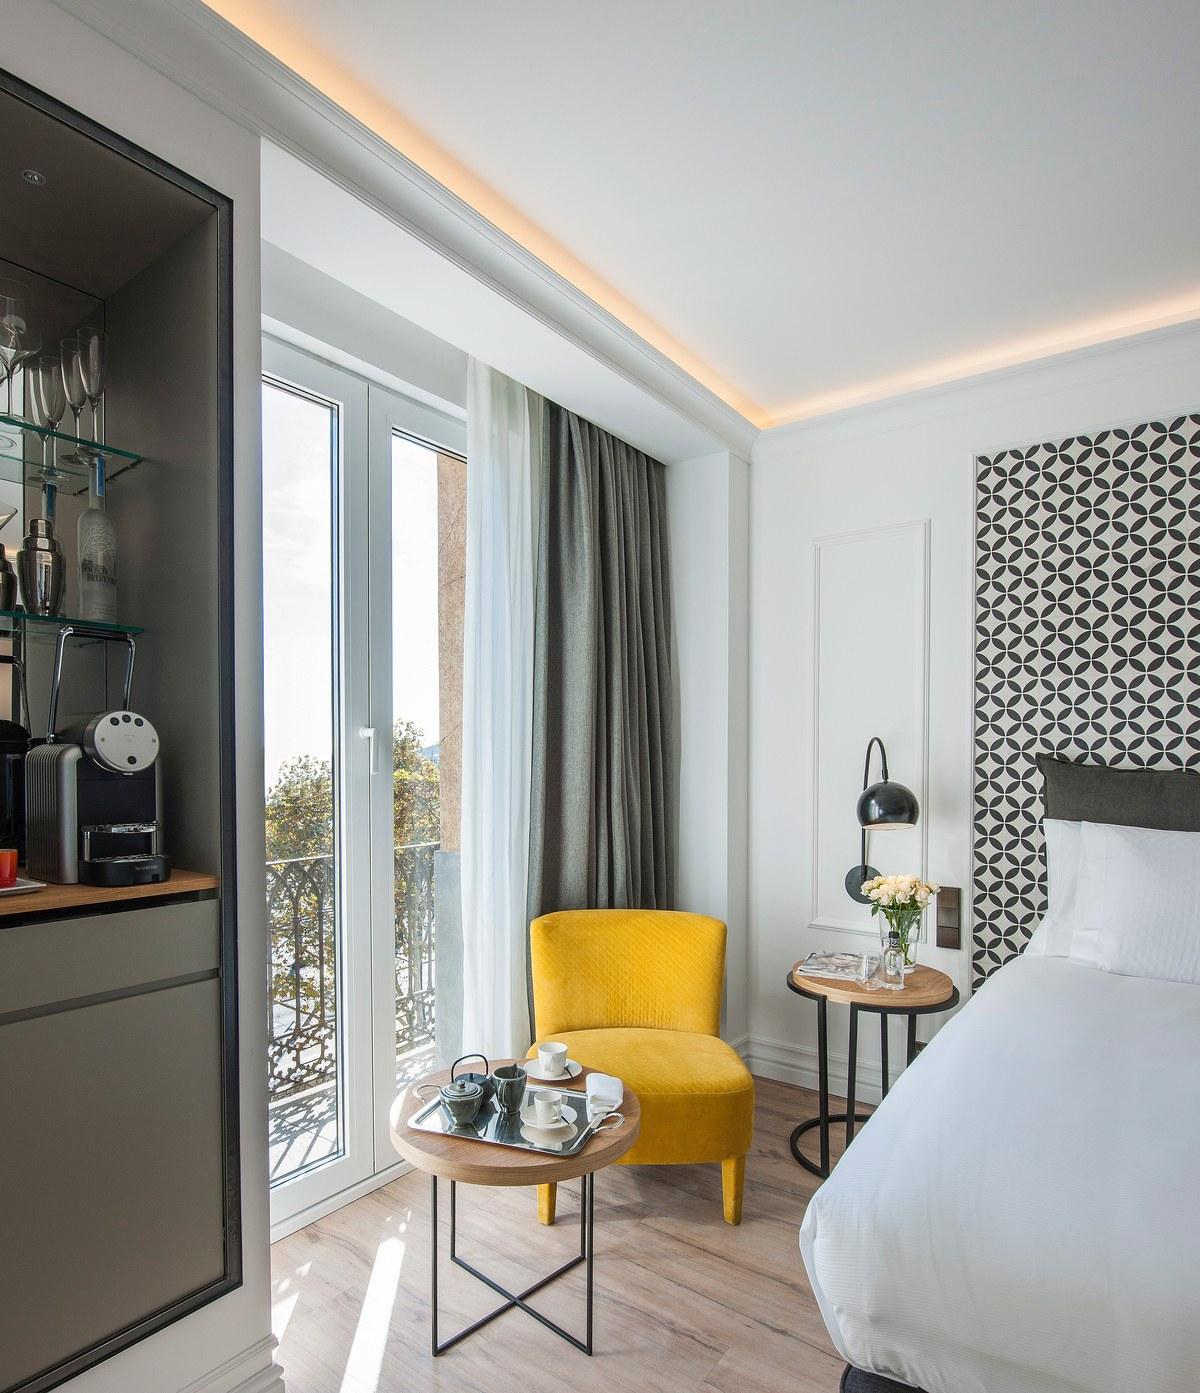 The Serras Hotel